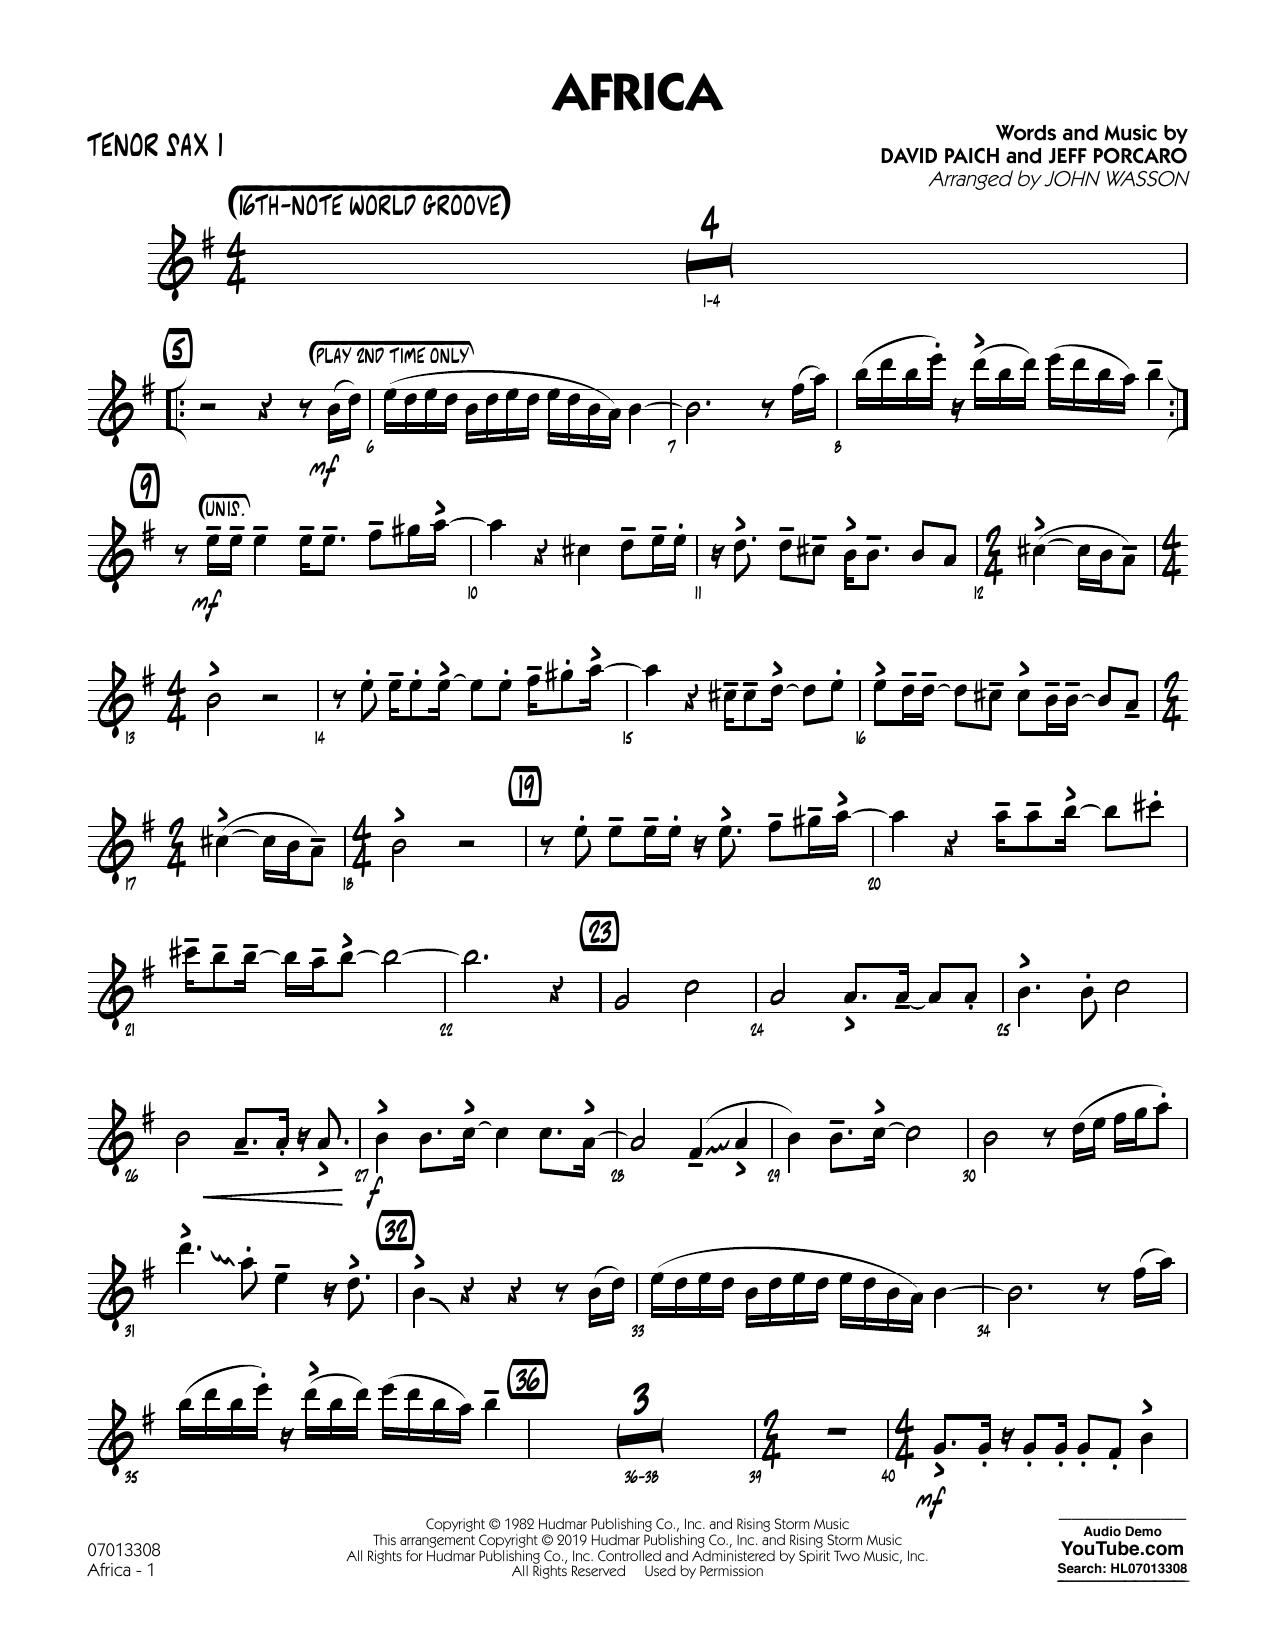 Africa (arr. John Wasson) - Tenor Sax 1 (Jazz Ensemble)